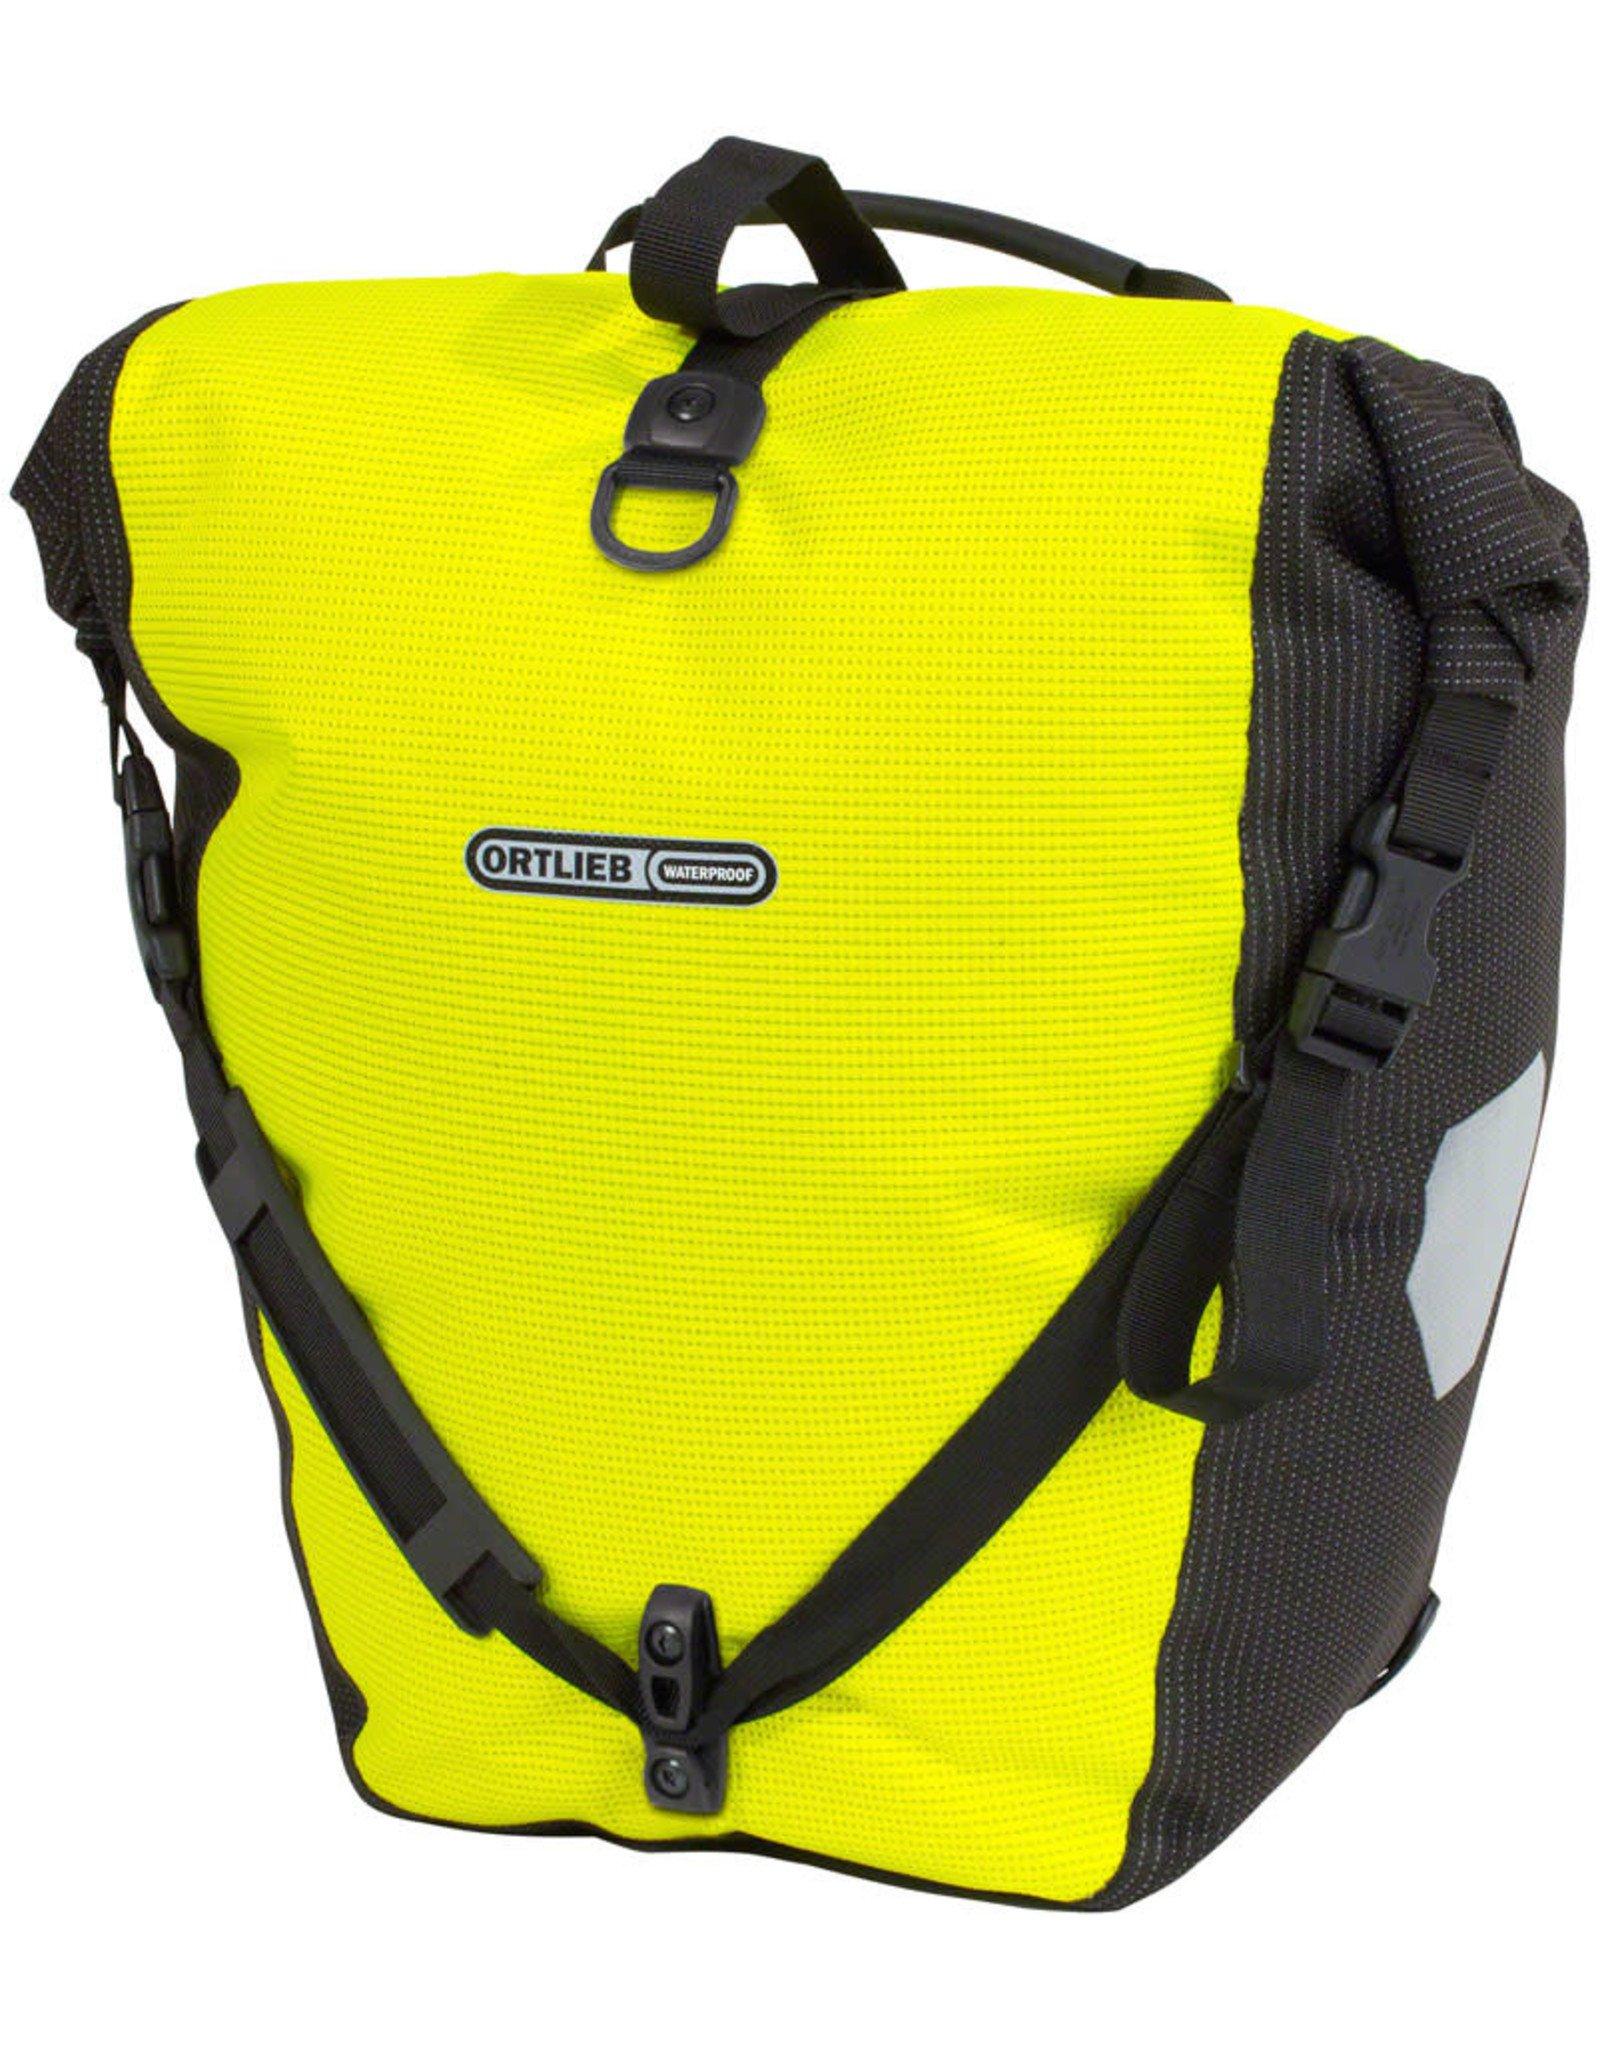 Ortlieb Ortlieb Back Roller Pannier - Single -  High Vis Yellow - 20L